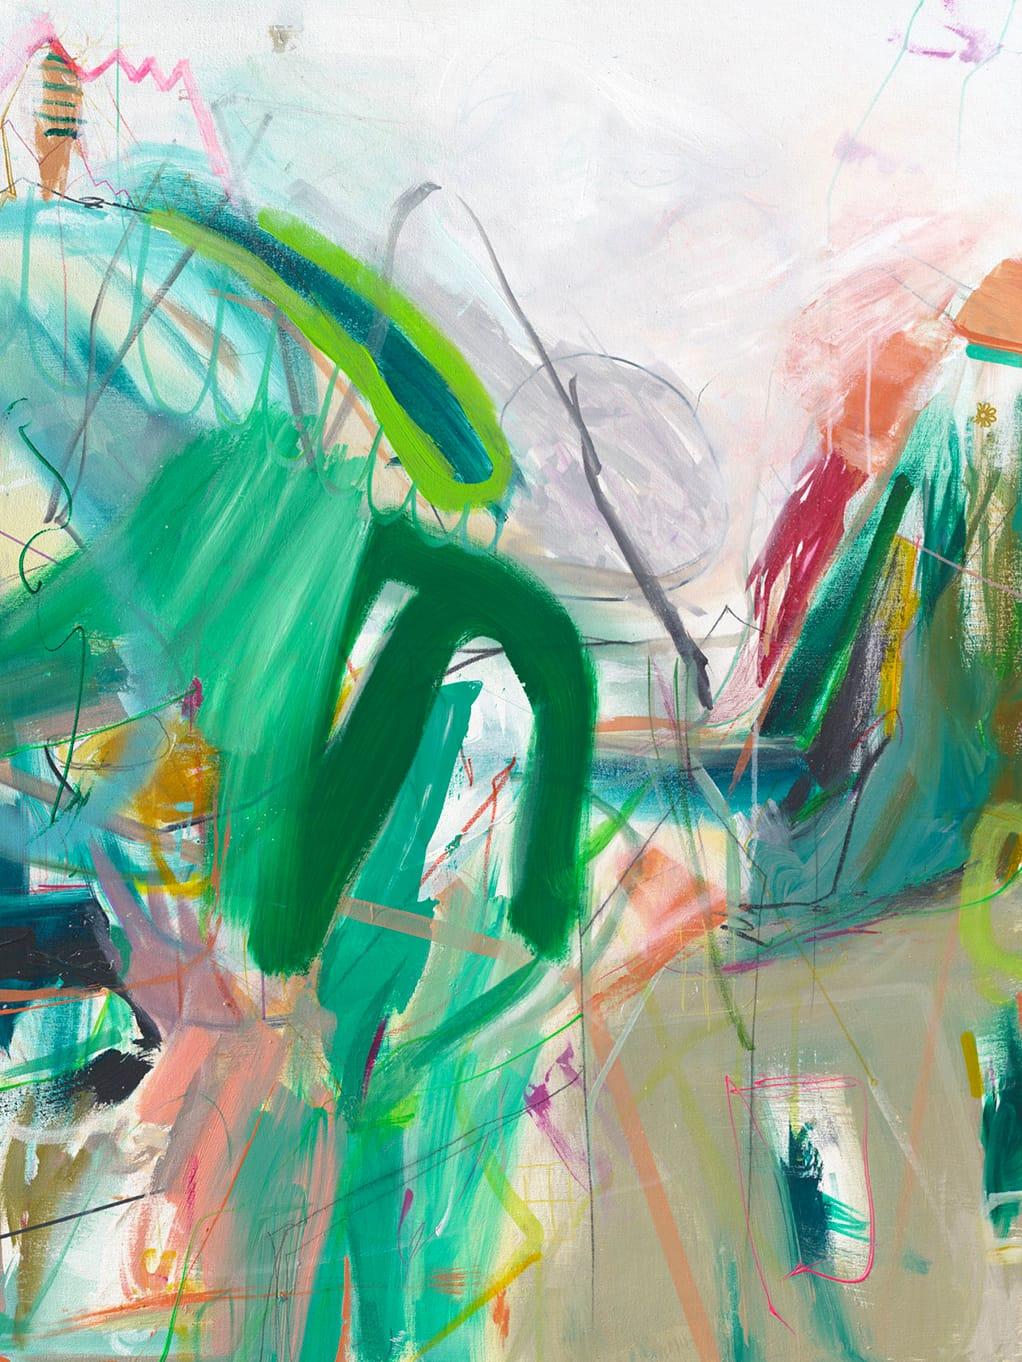 Märchenland (Fairy[tale] land) by Jamie Derringer, 2015. Acrylic, spray enamel, marker, pencil and fabric paint on canvas.